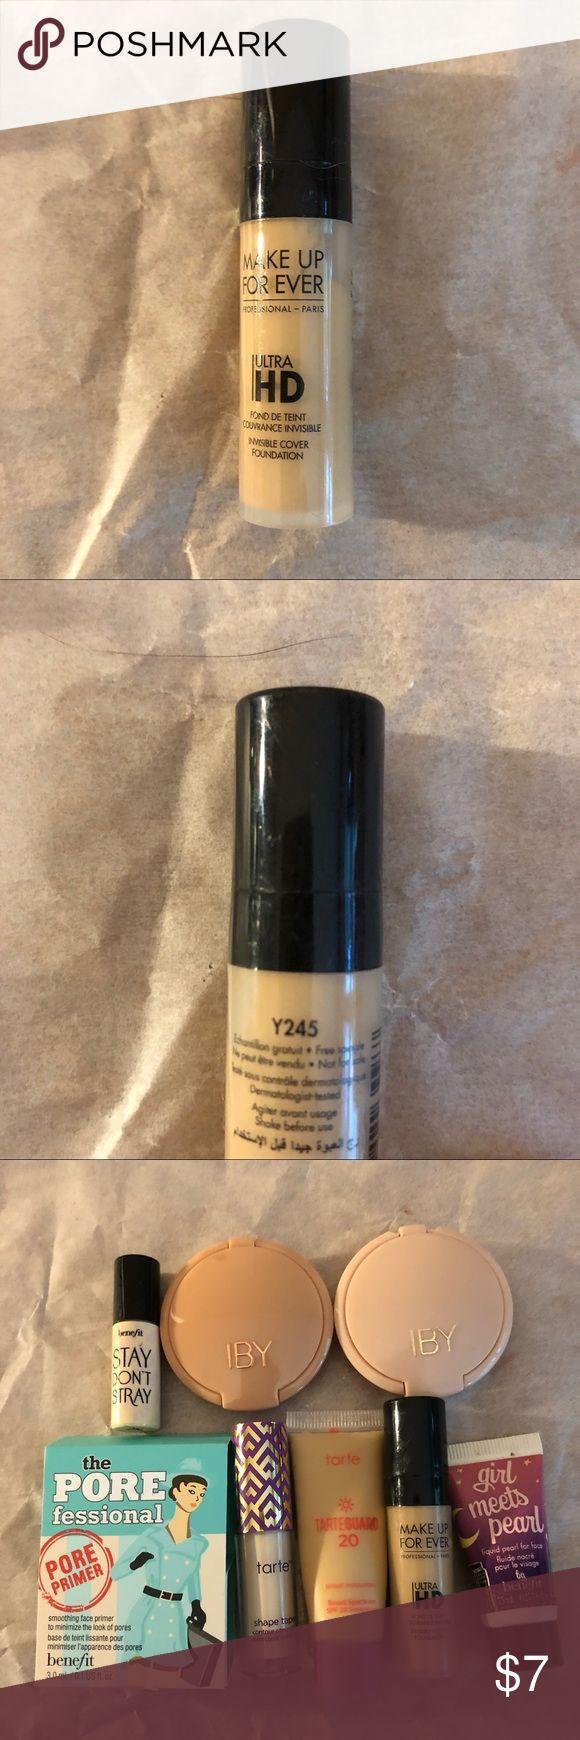 Make Up For Ever Ultra HD foundation sample Make up for